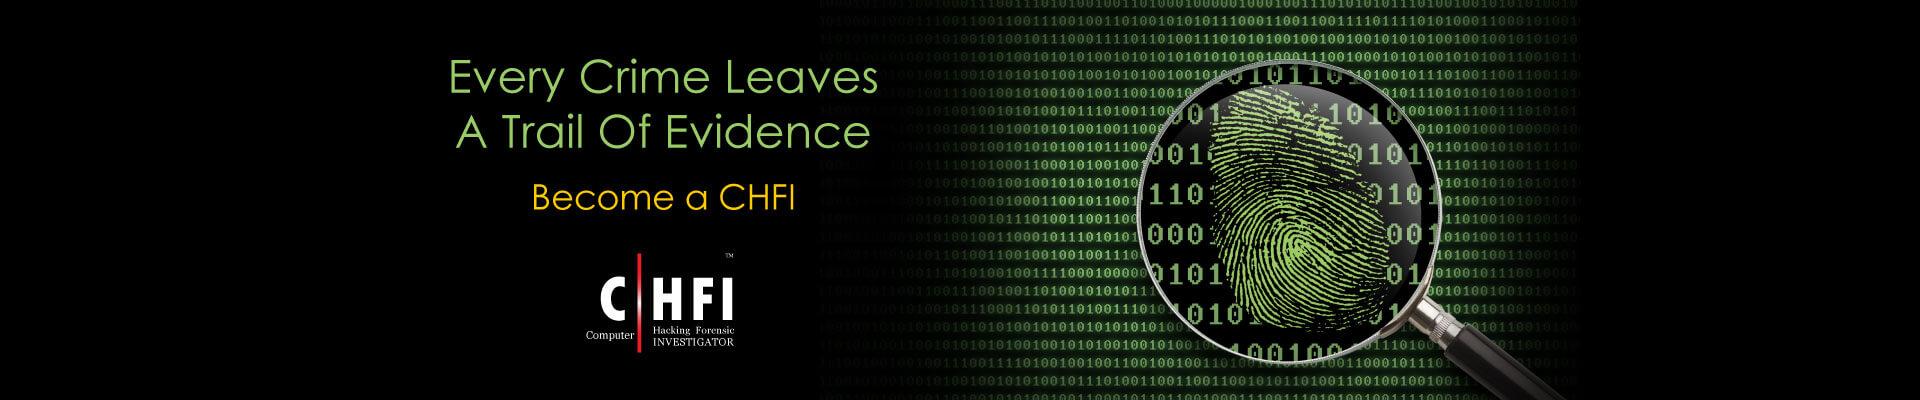 Chfi V9 Cyber Digital Crime Forensic Training Certification In